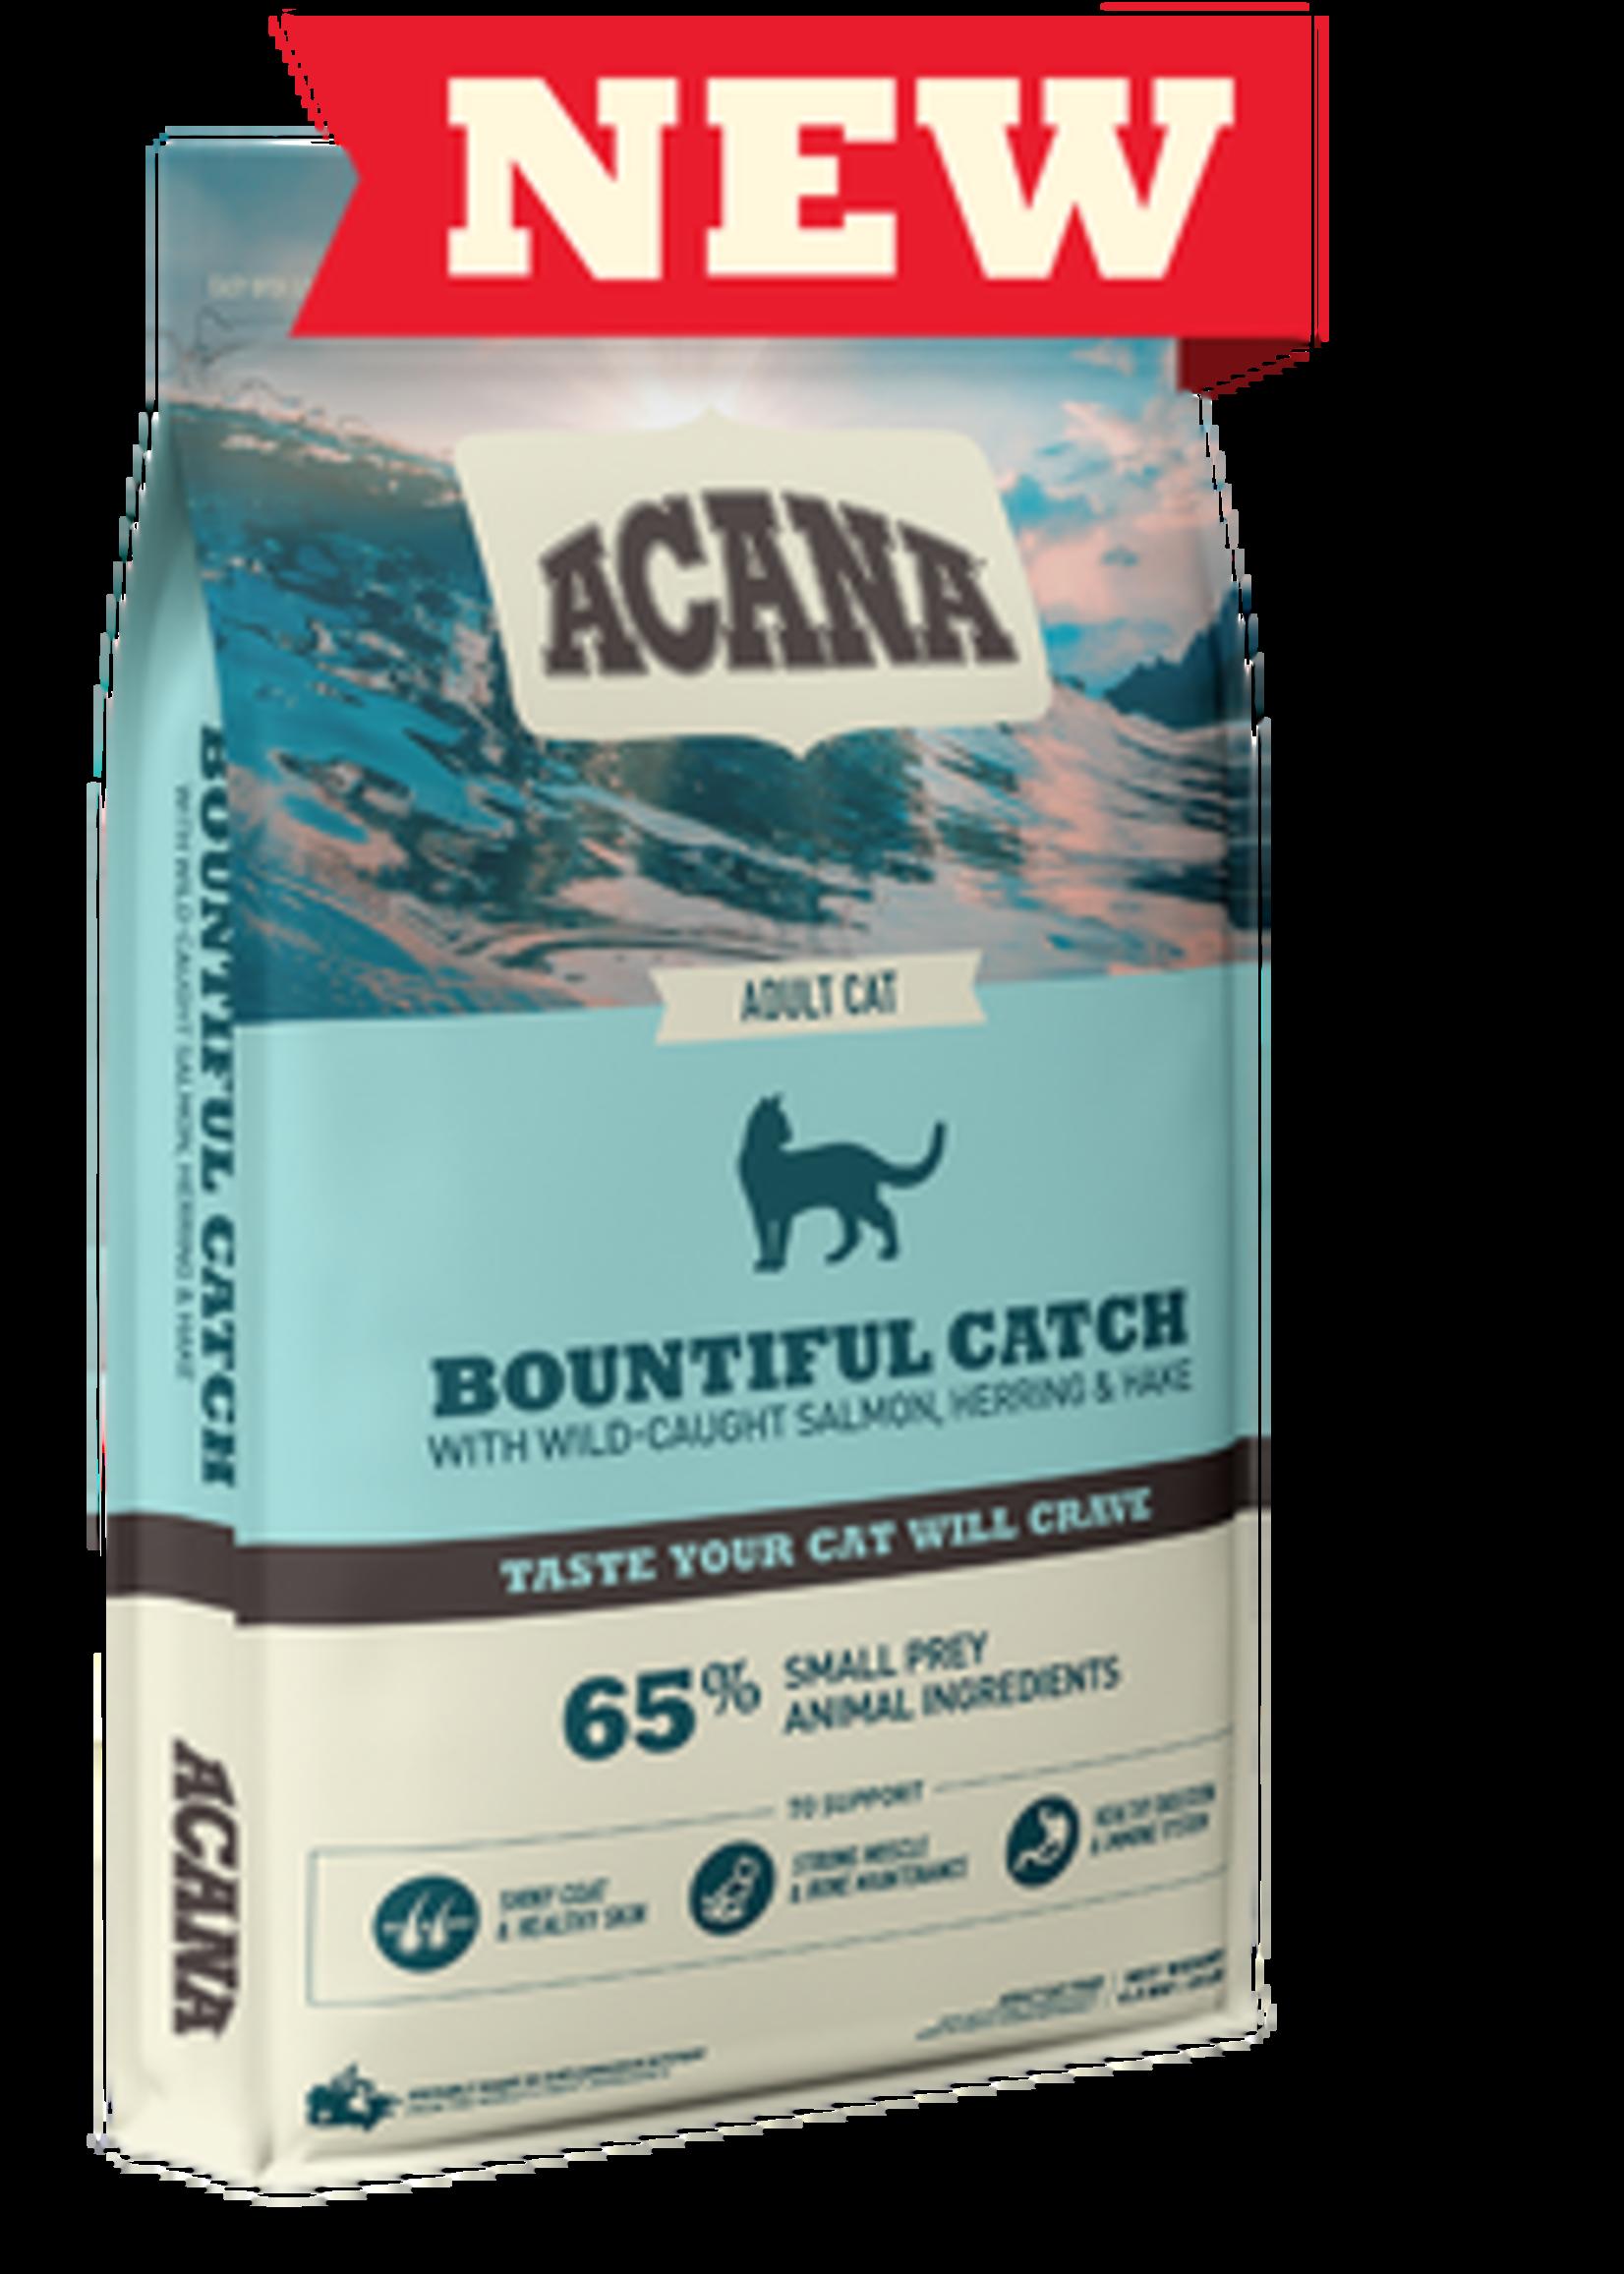 Acana® Acana Bountiful Catch